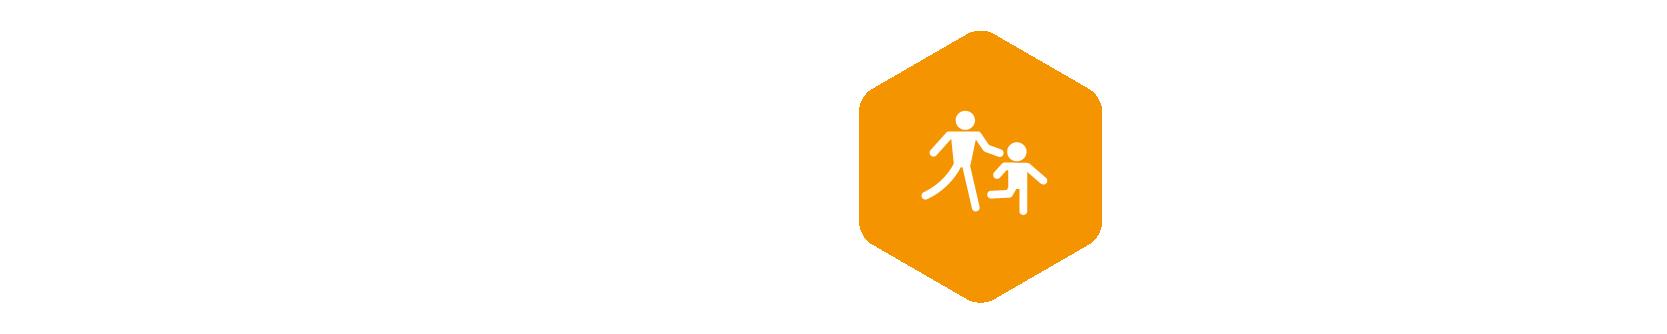 crossspz_logo